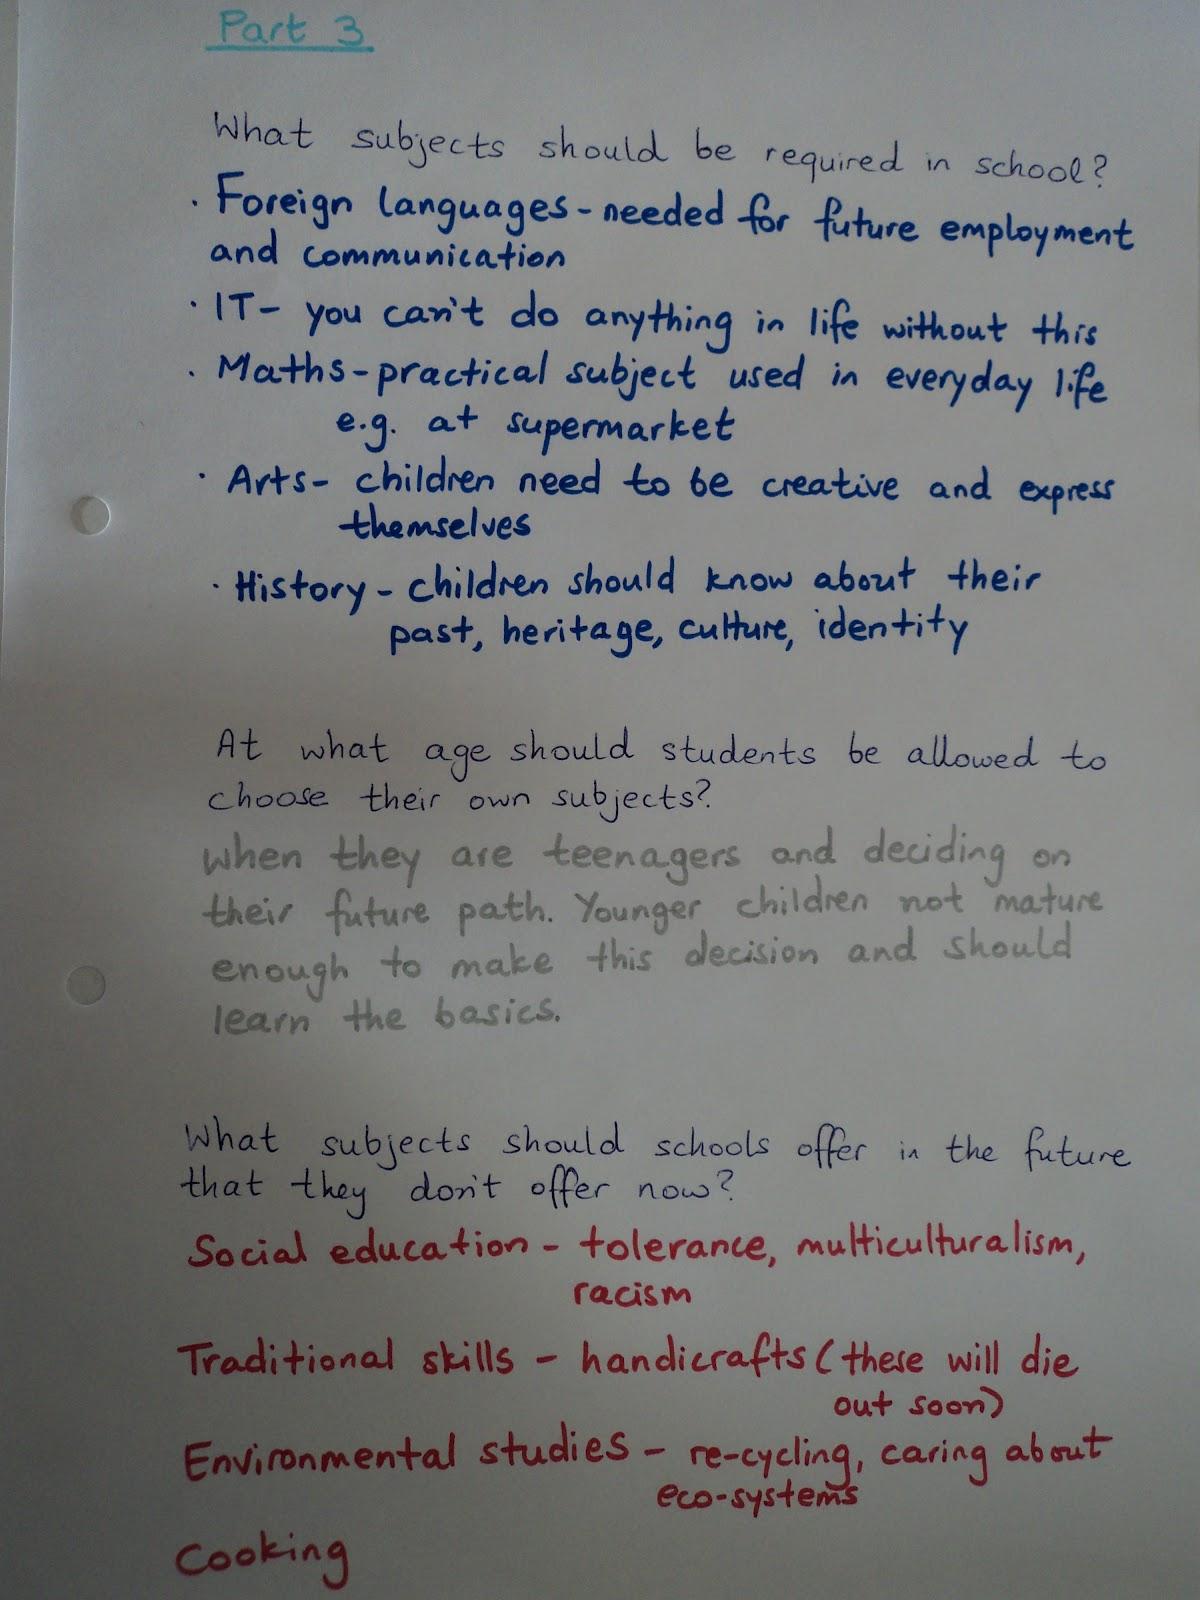 ielts speaking part 3 questions pdf